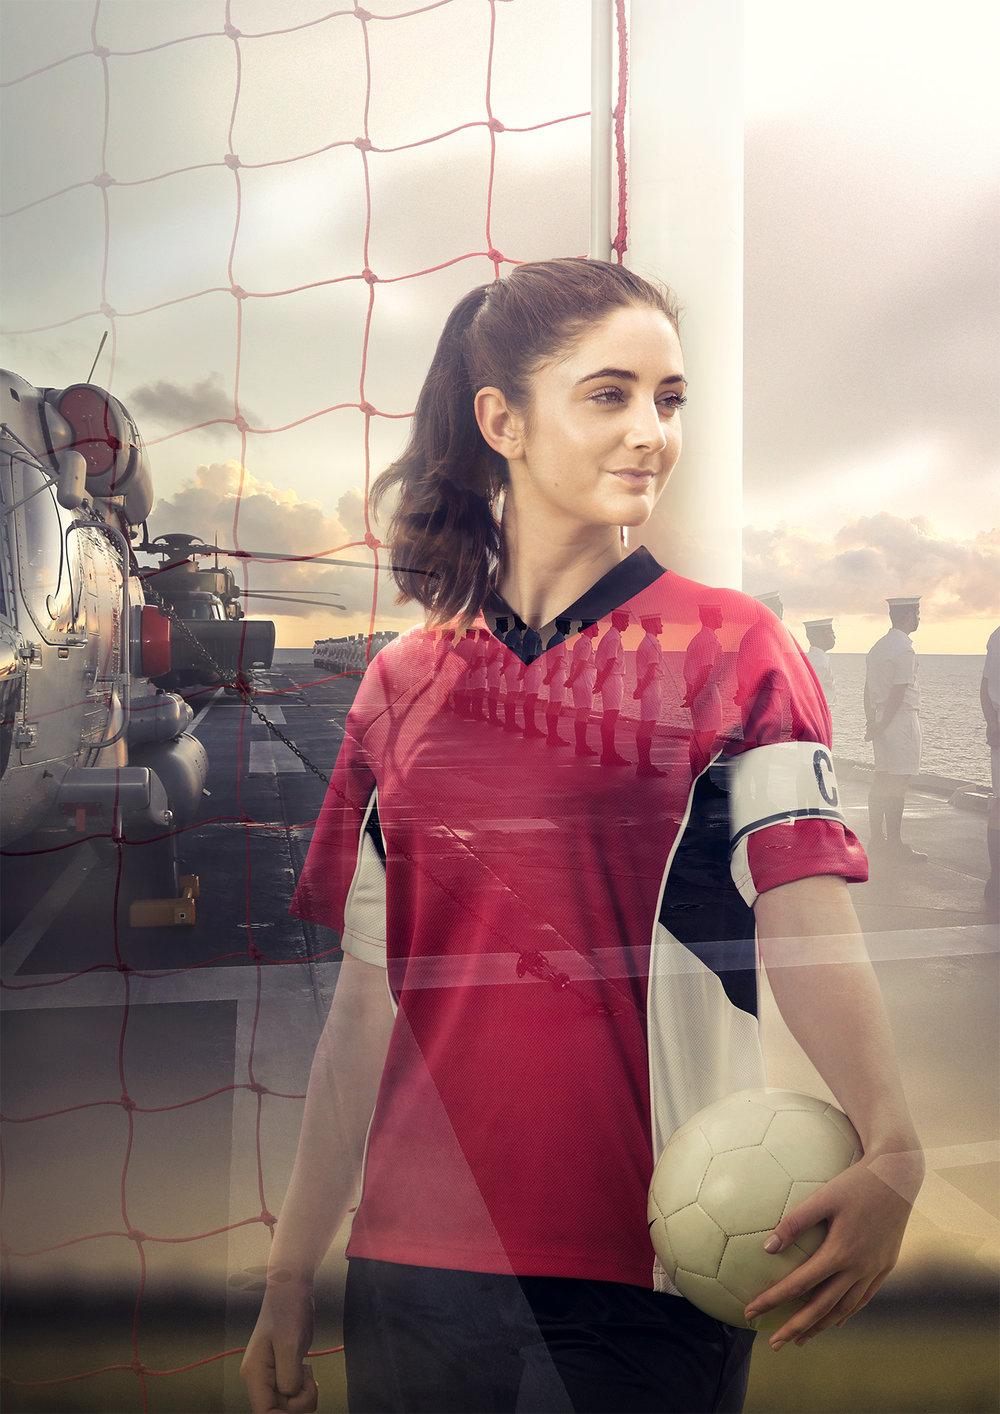 NAVY_Brand_Soccer 1500pxW.jpg